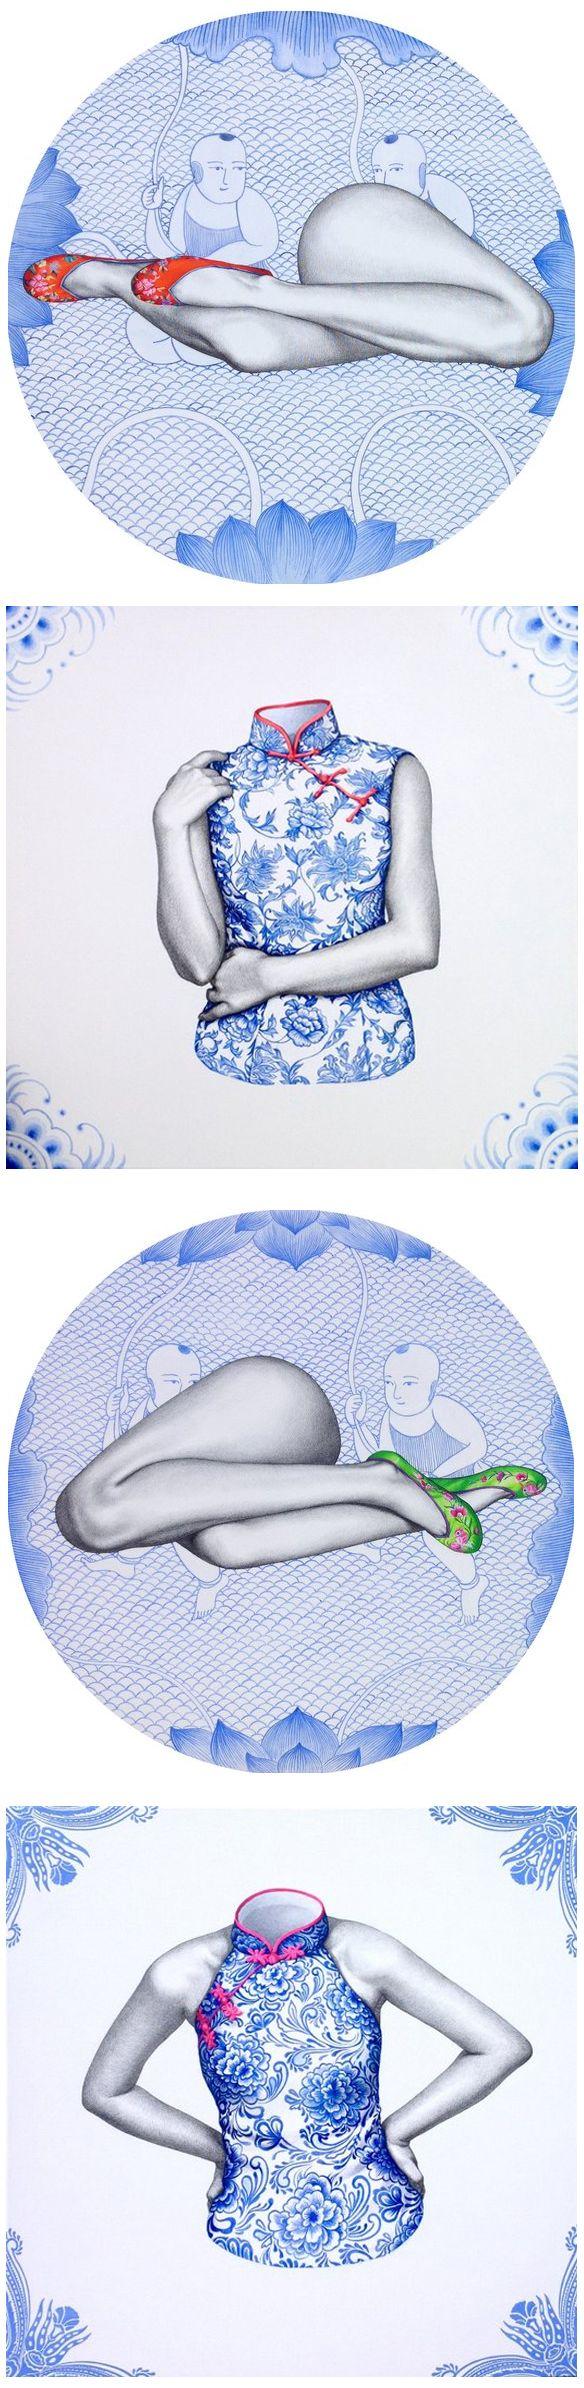 xu ying (graphite and acrylic)